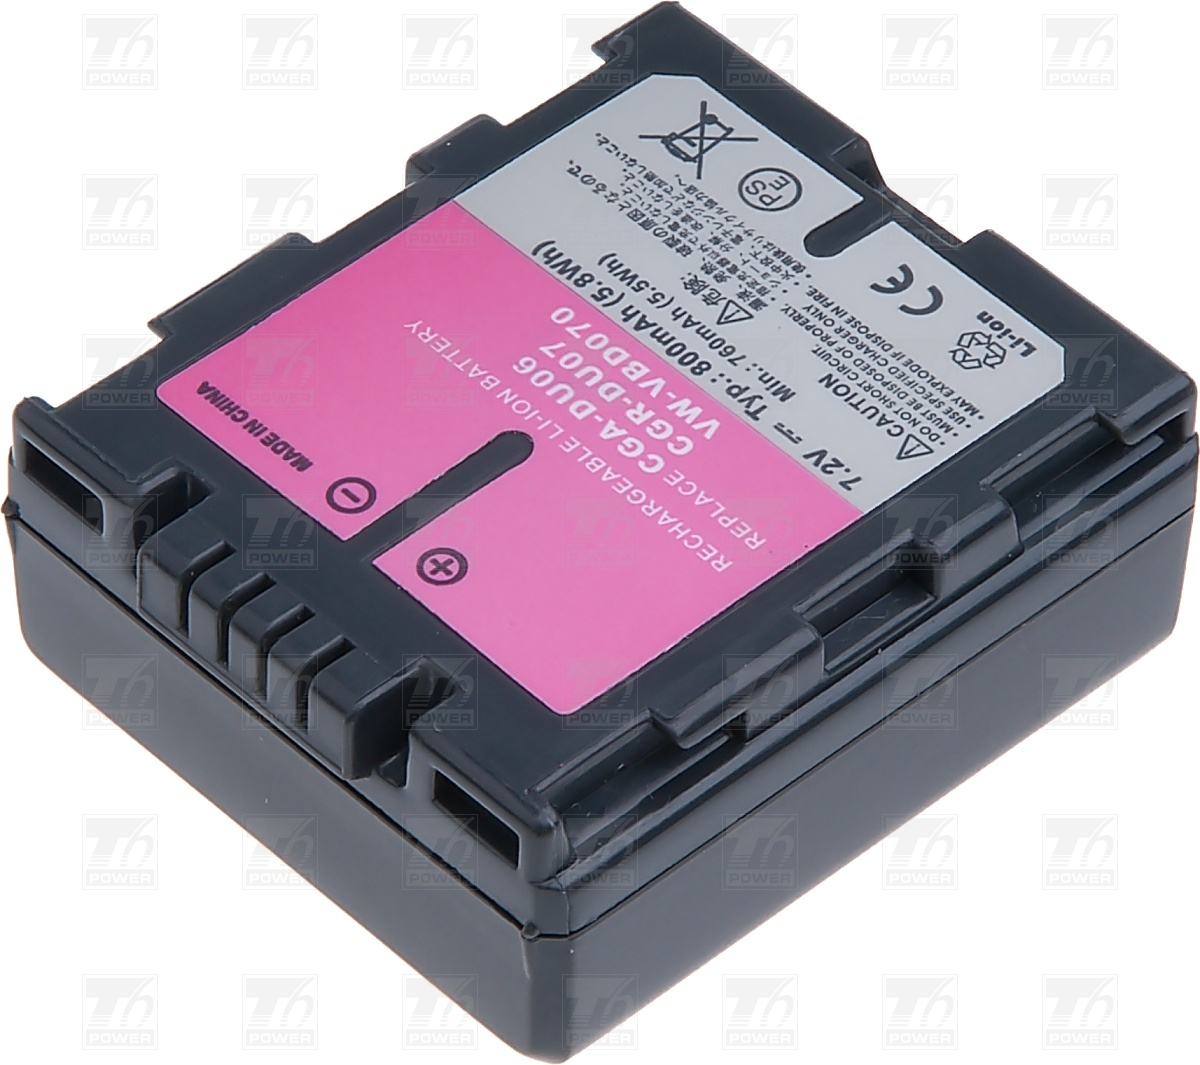 T6 power Baterie T6 power CGR-DU07, VW-VBD070, CGA-DU07, CGA-DU0